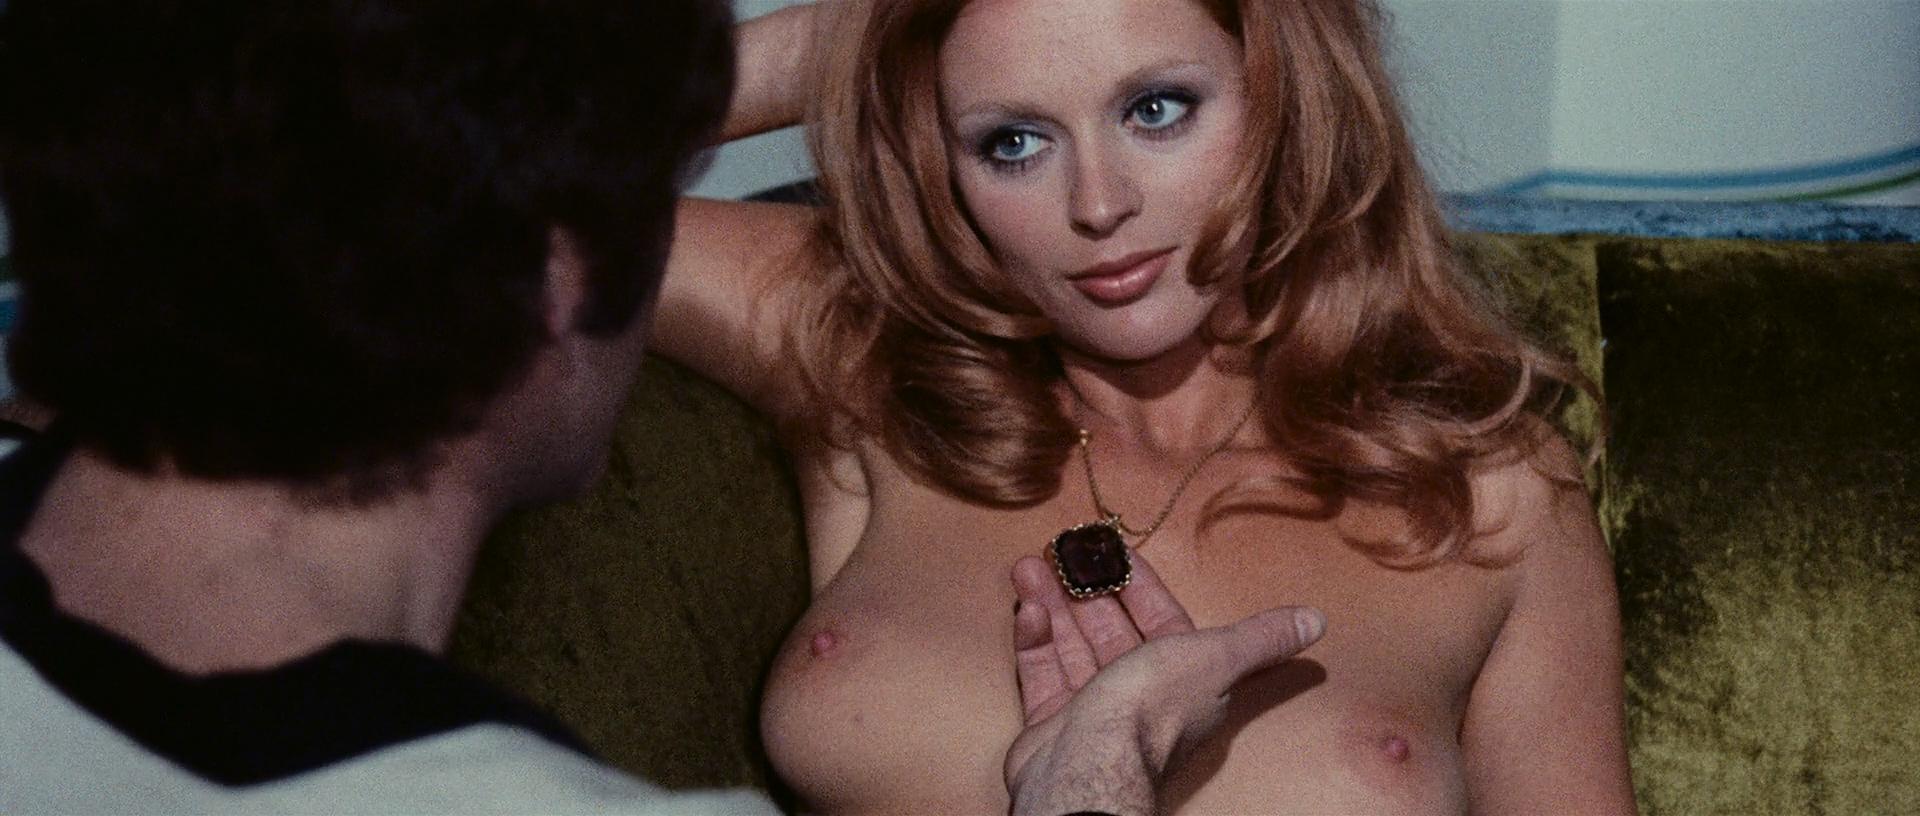 Christie brinkley nude pics